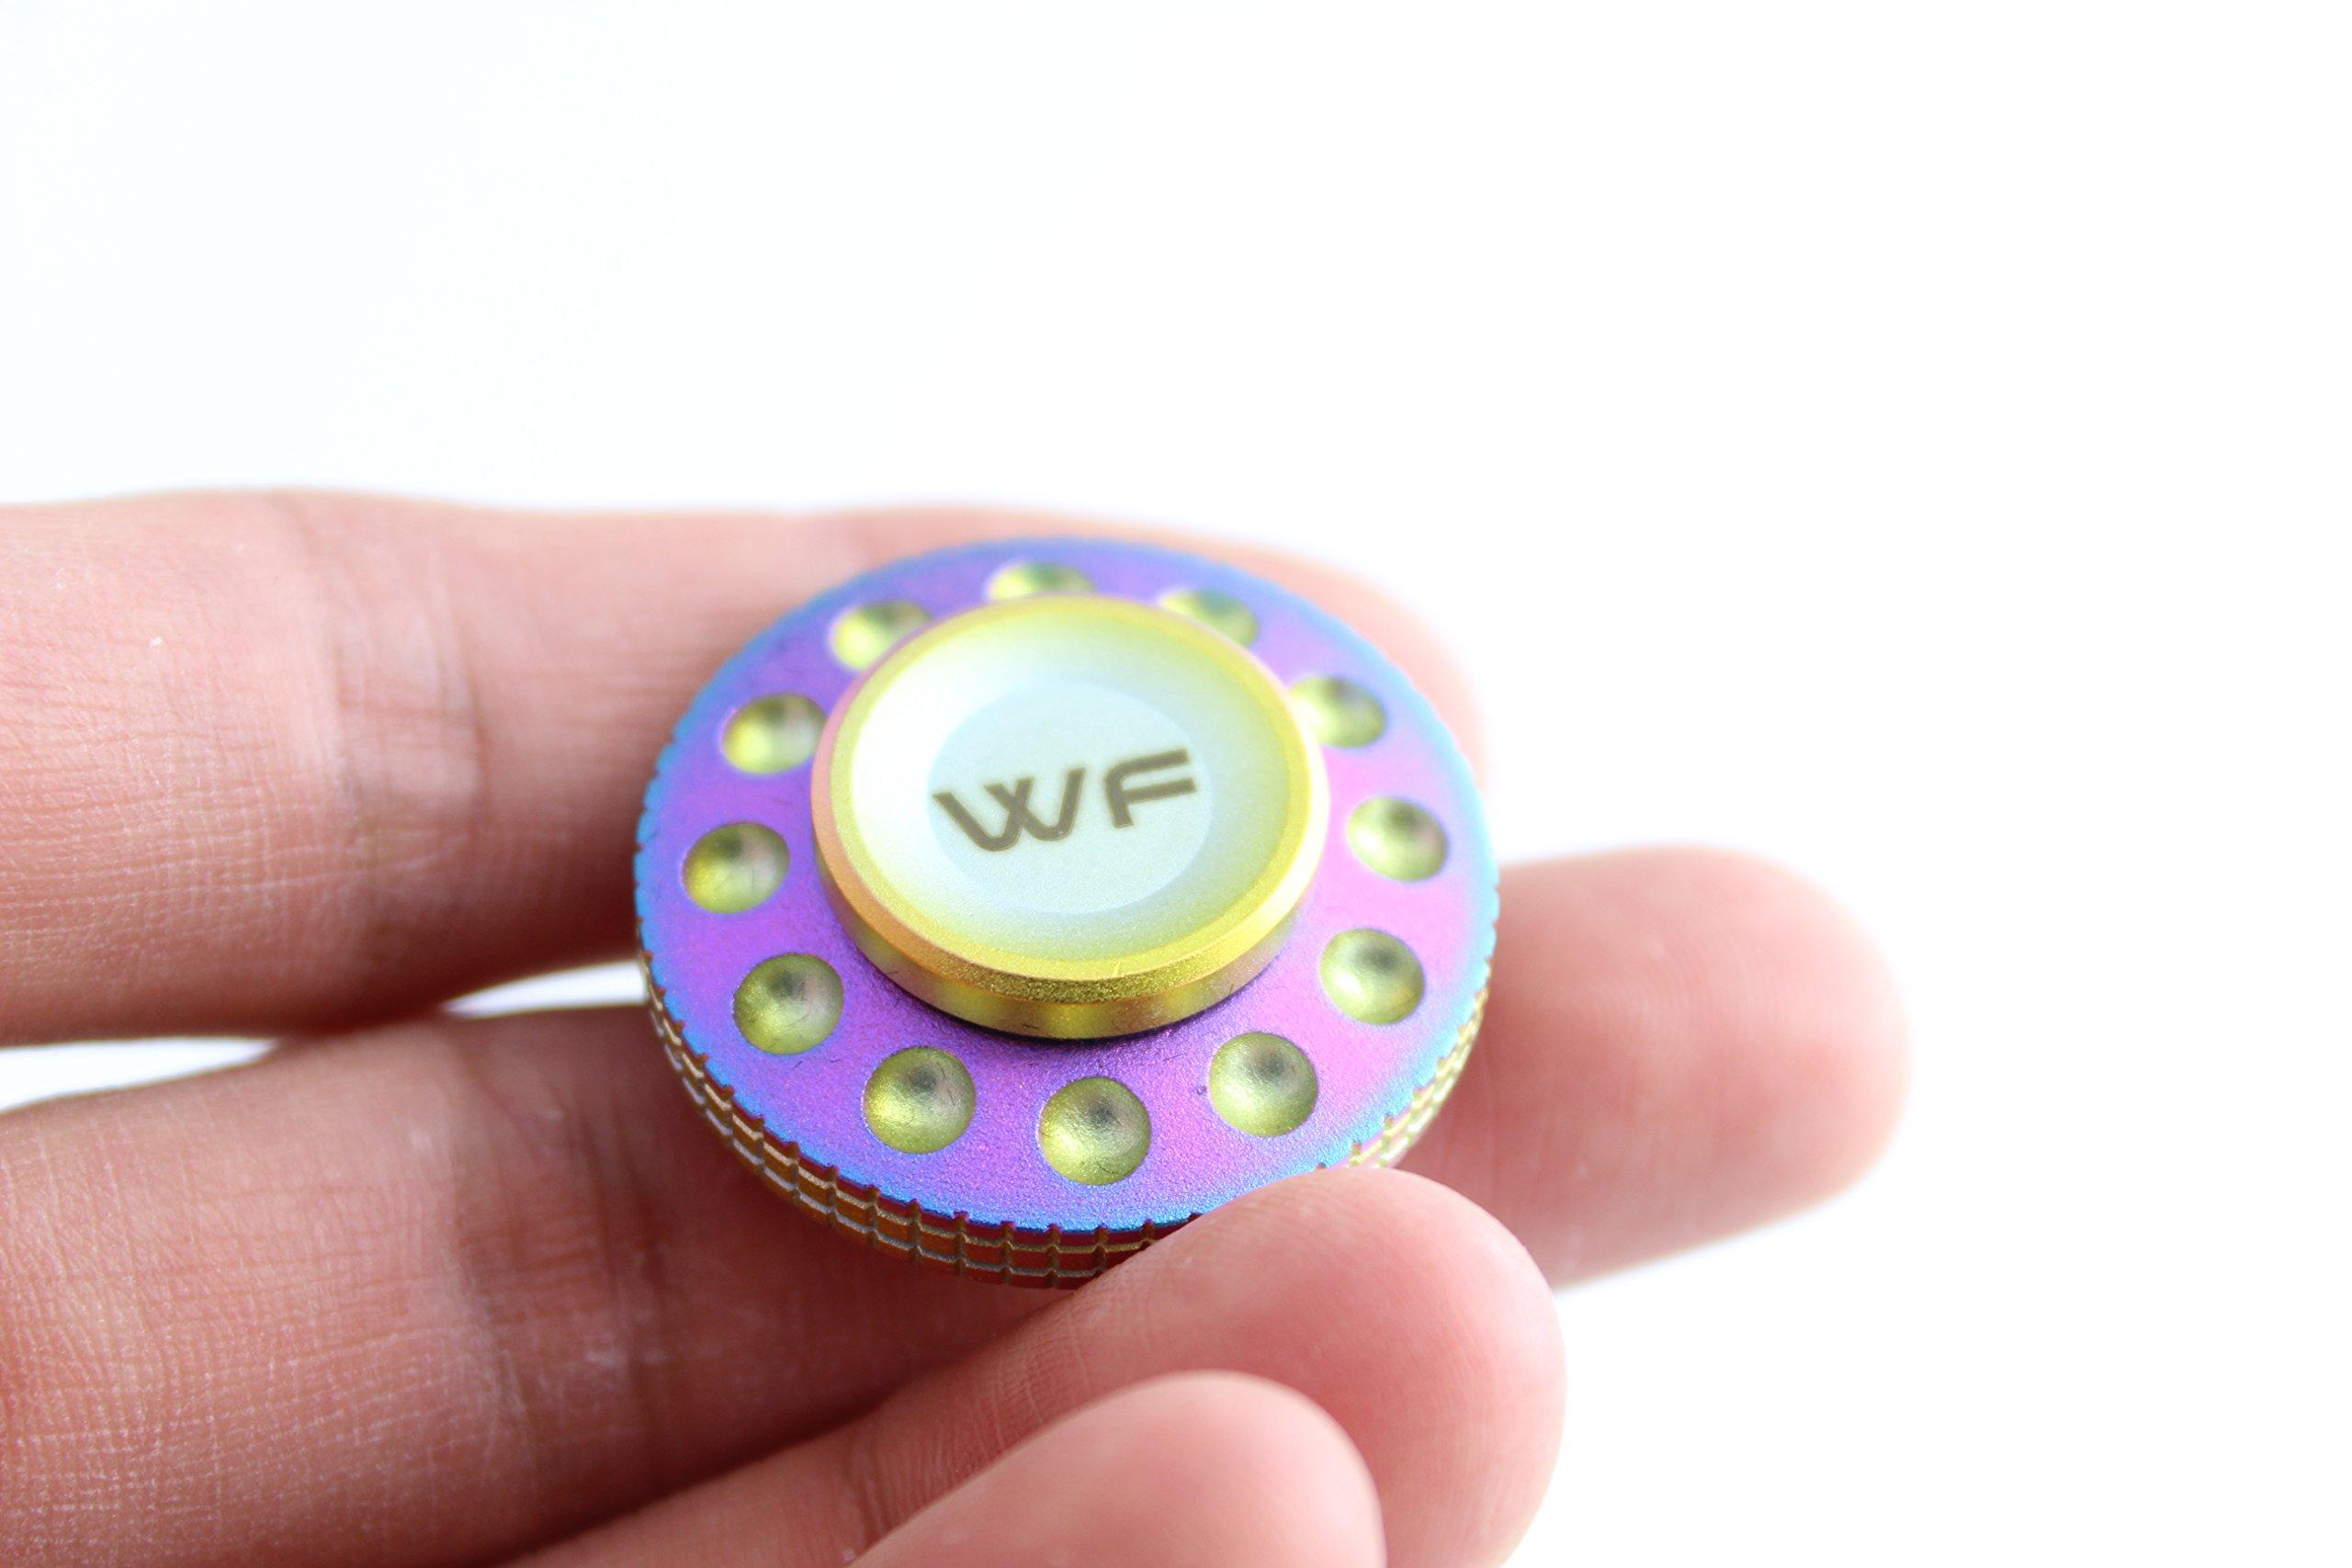 WeFidget Original Mini UFO Fidget Spinner, Super Discrete, Premium Finish, Replaceable Bearings. by WeFidget (Image #4)